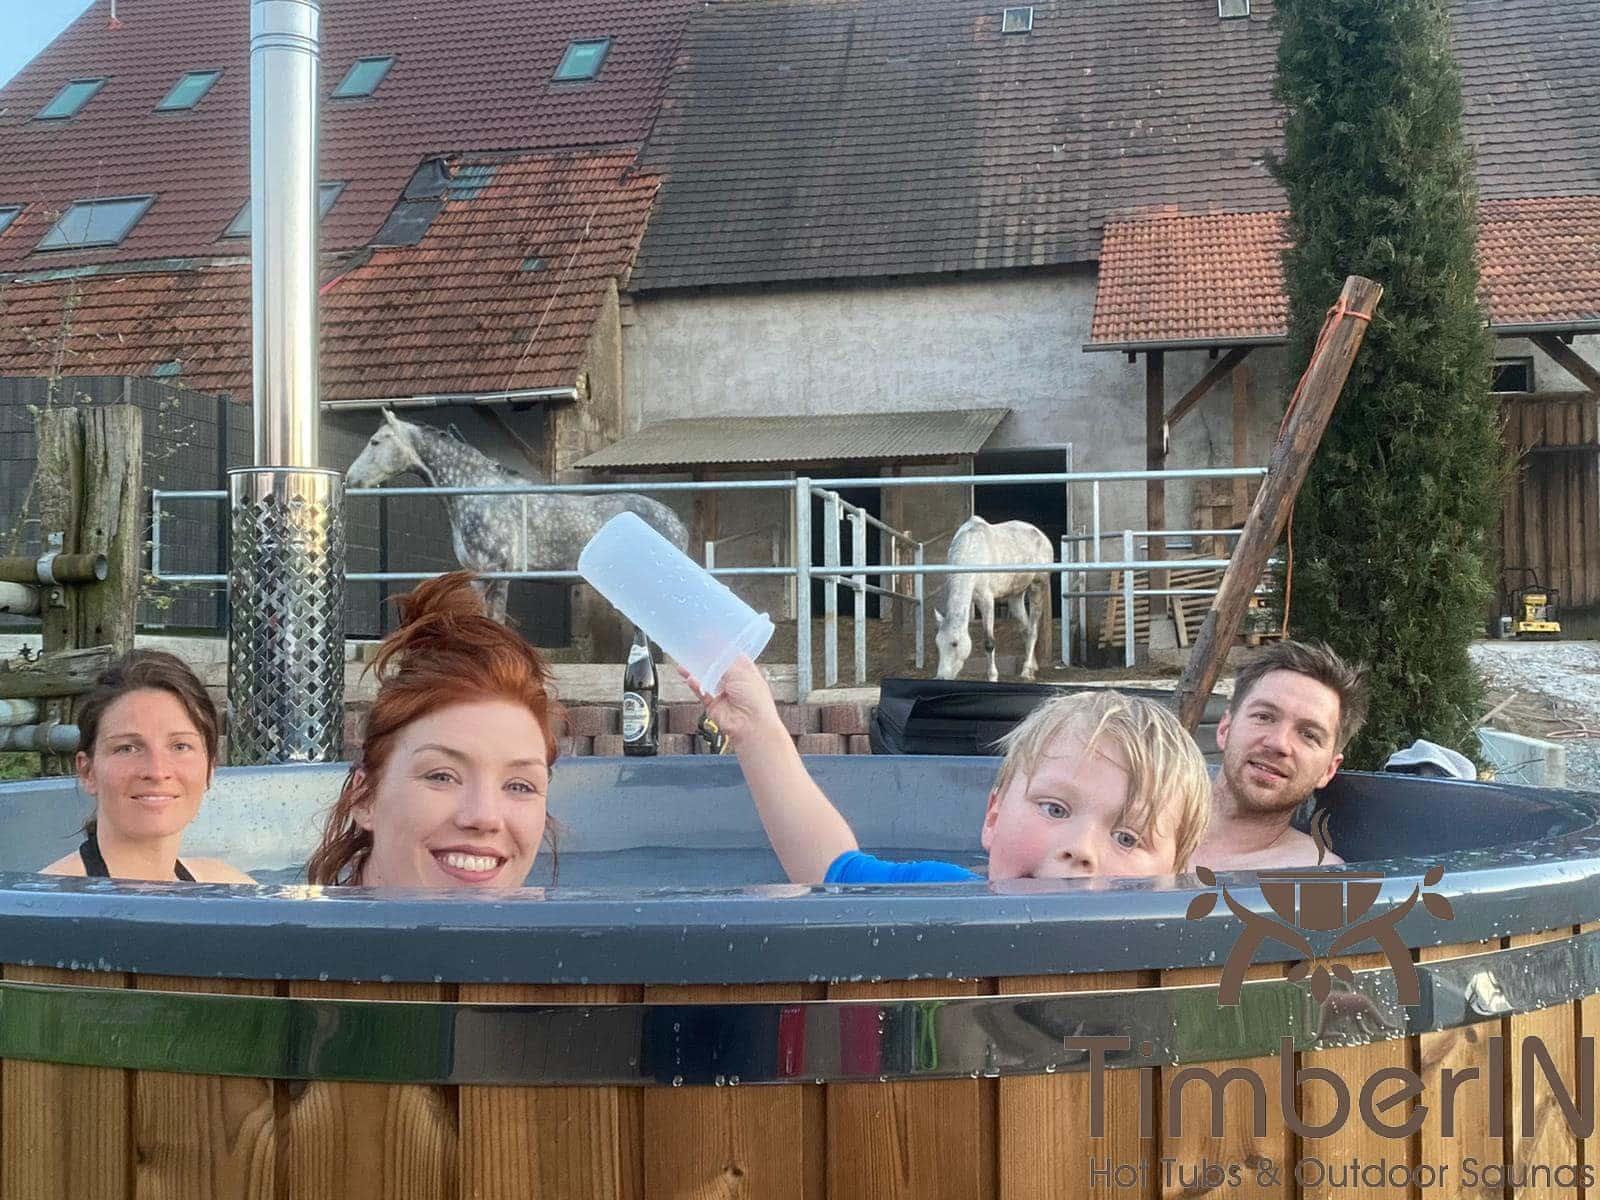 Badezuber Badefass Hot Tube mit Whirlpool Holzofen TimberIN Rojal Christian Graben Neudorf Deutschland 1